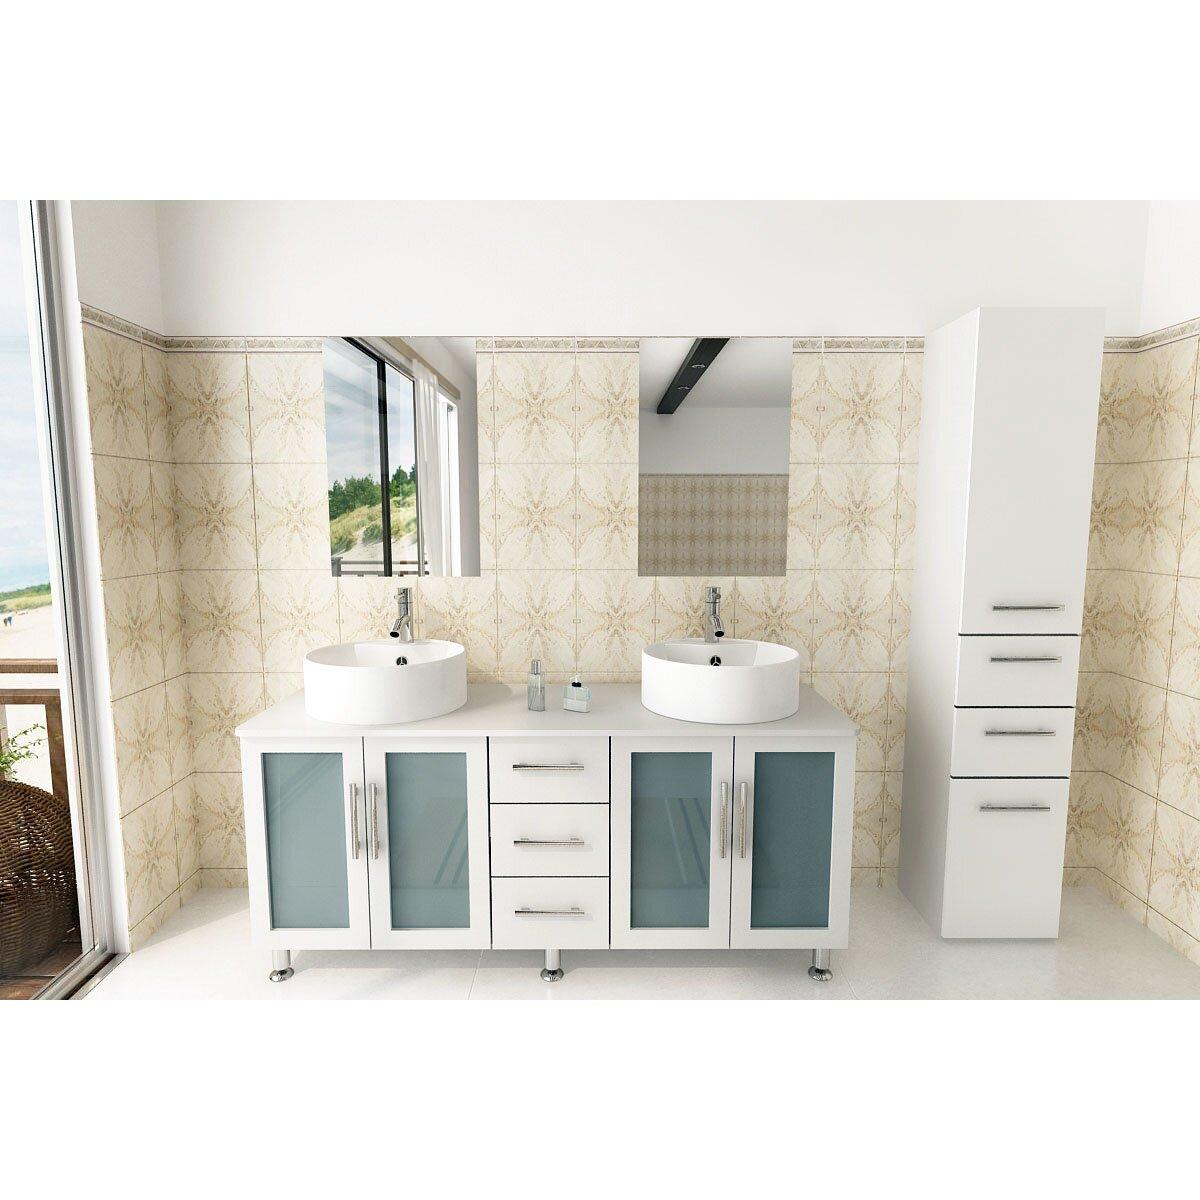 Jwh living lune 59 double vessel modern bathroom vanity - Contemporary bathroom vanity sets ...